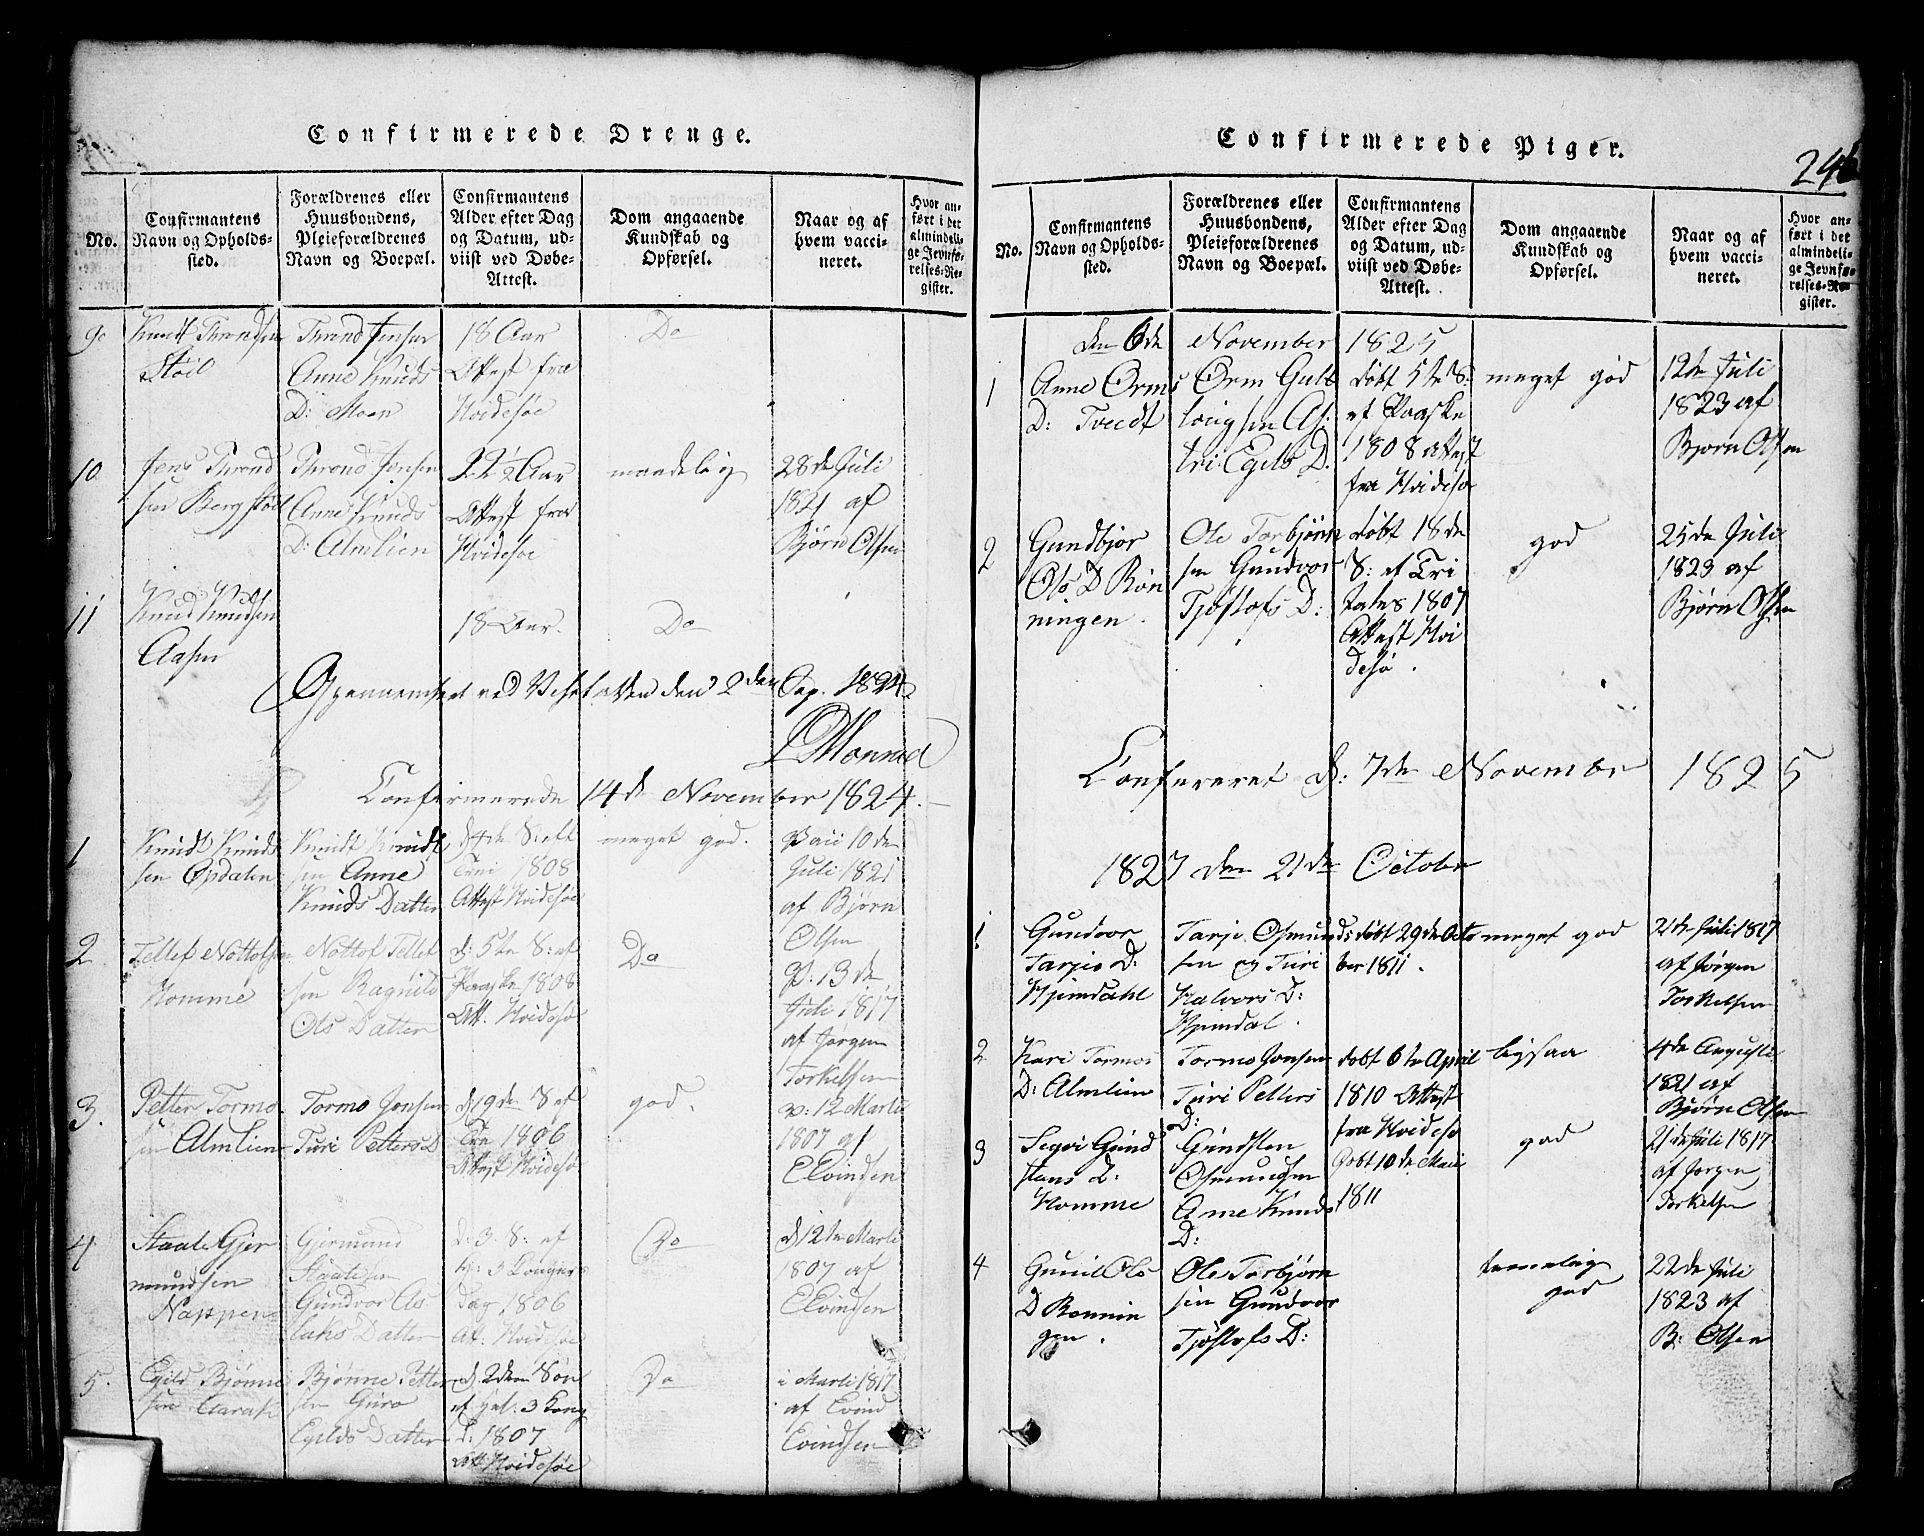 SAKO, Nissedal kirkebøker, G/Gb/L0001: Klokkerbok nr. II 1, 1814-1862, s. 246